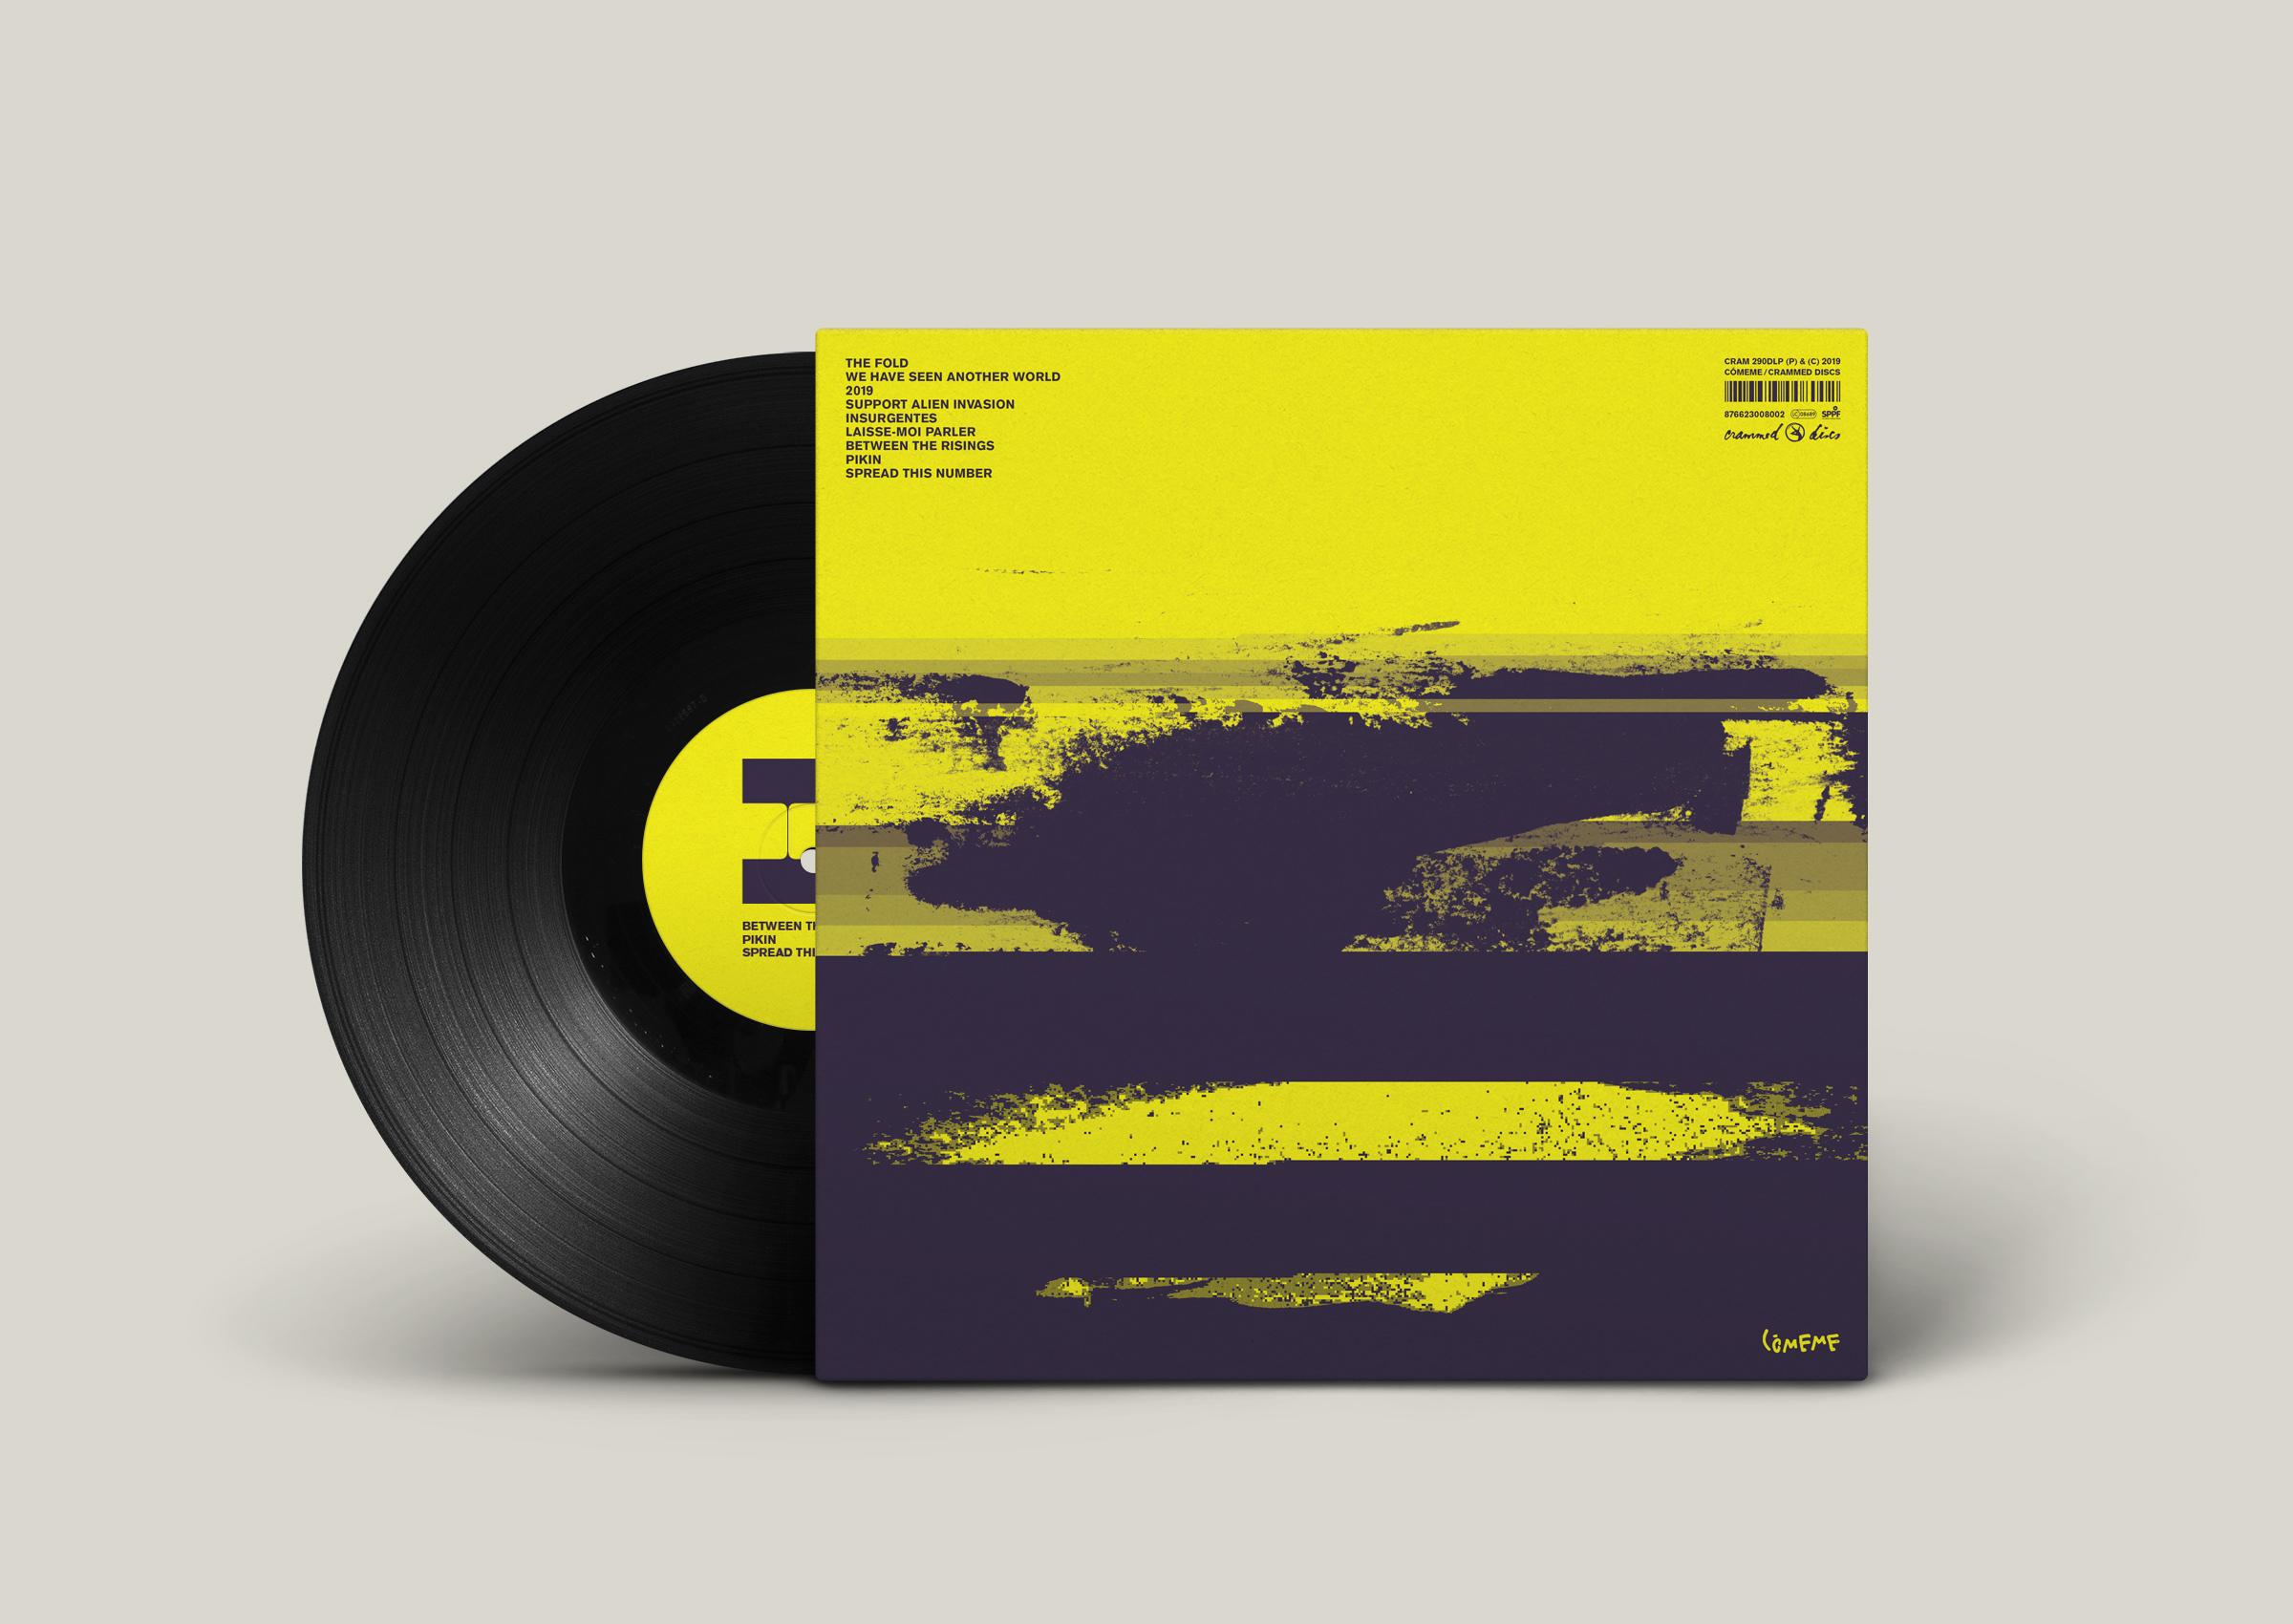 Vinyl-Record-PSD-MockUp_Matias_SAI_back_greyish